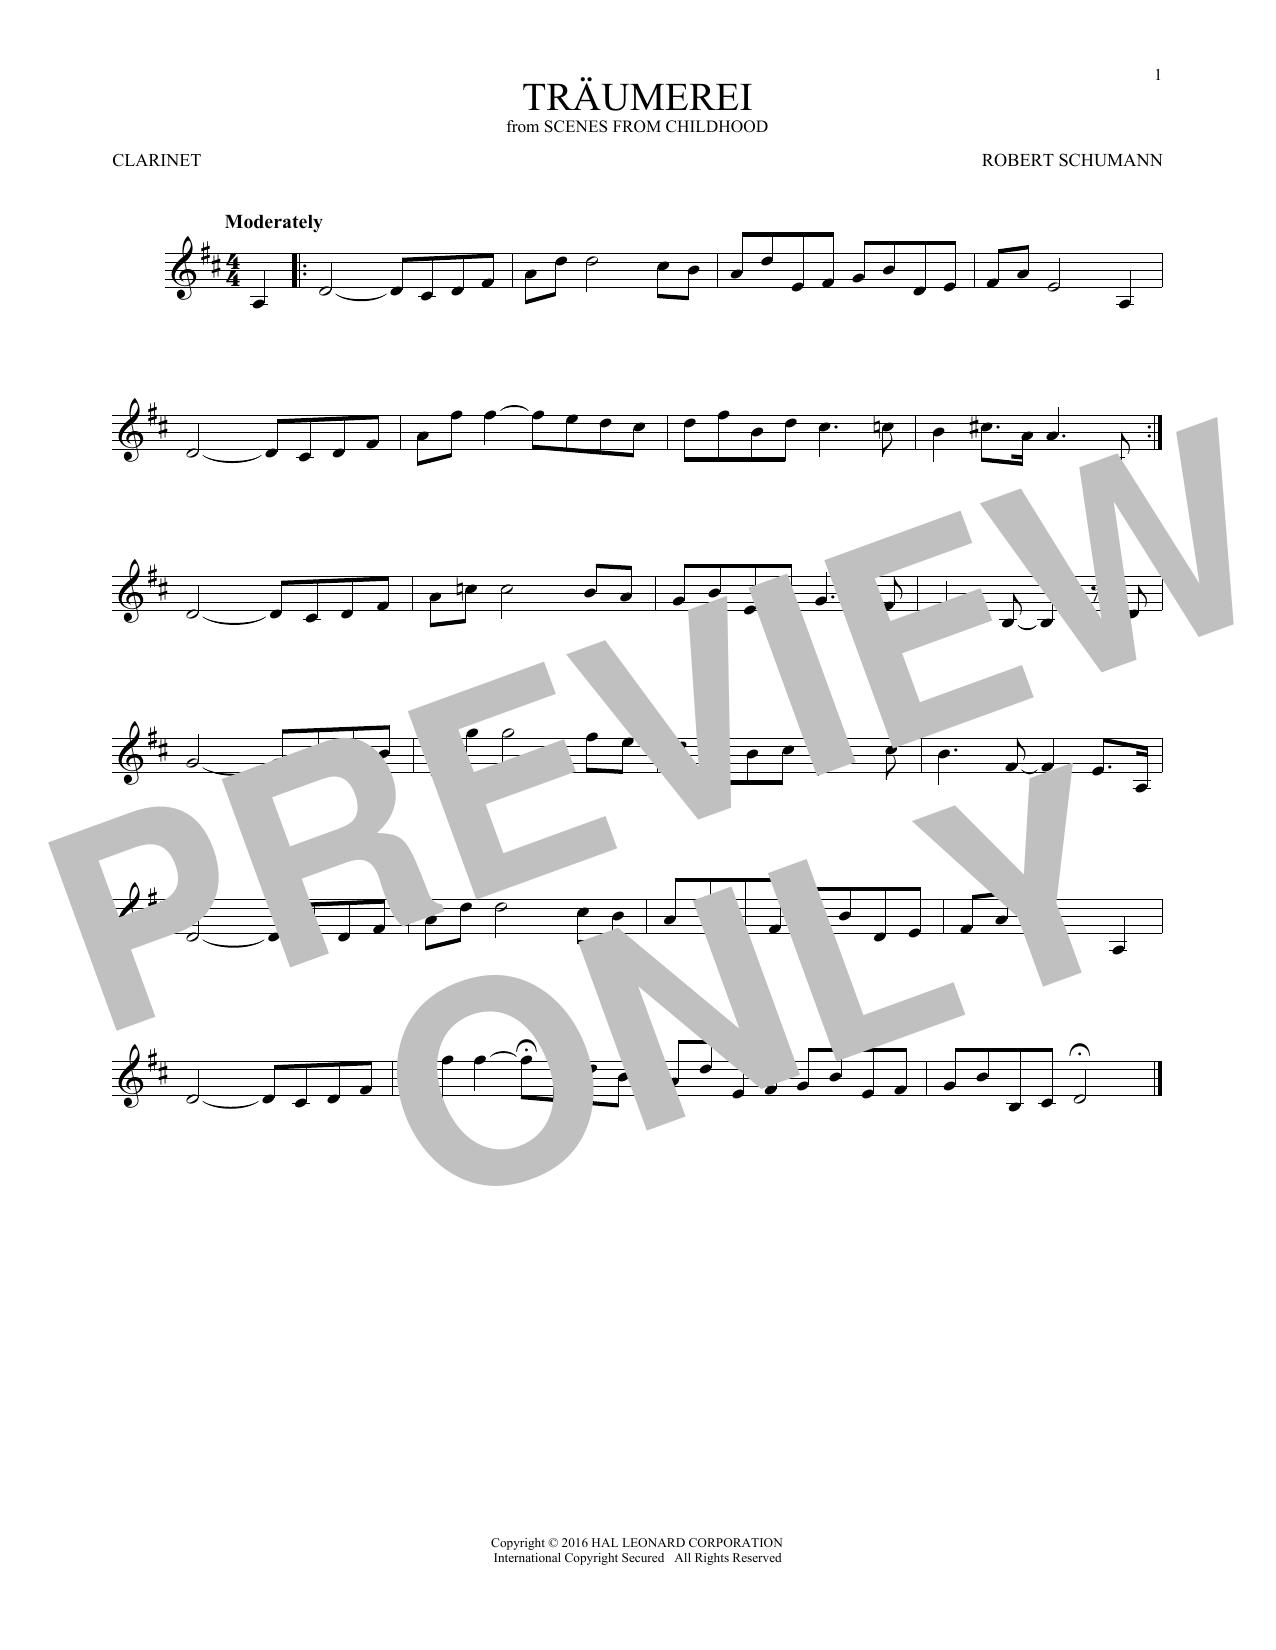 Traumerei (Clarinet Solo)